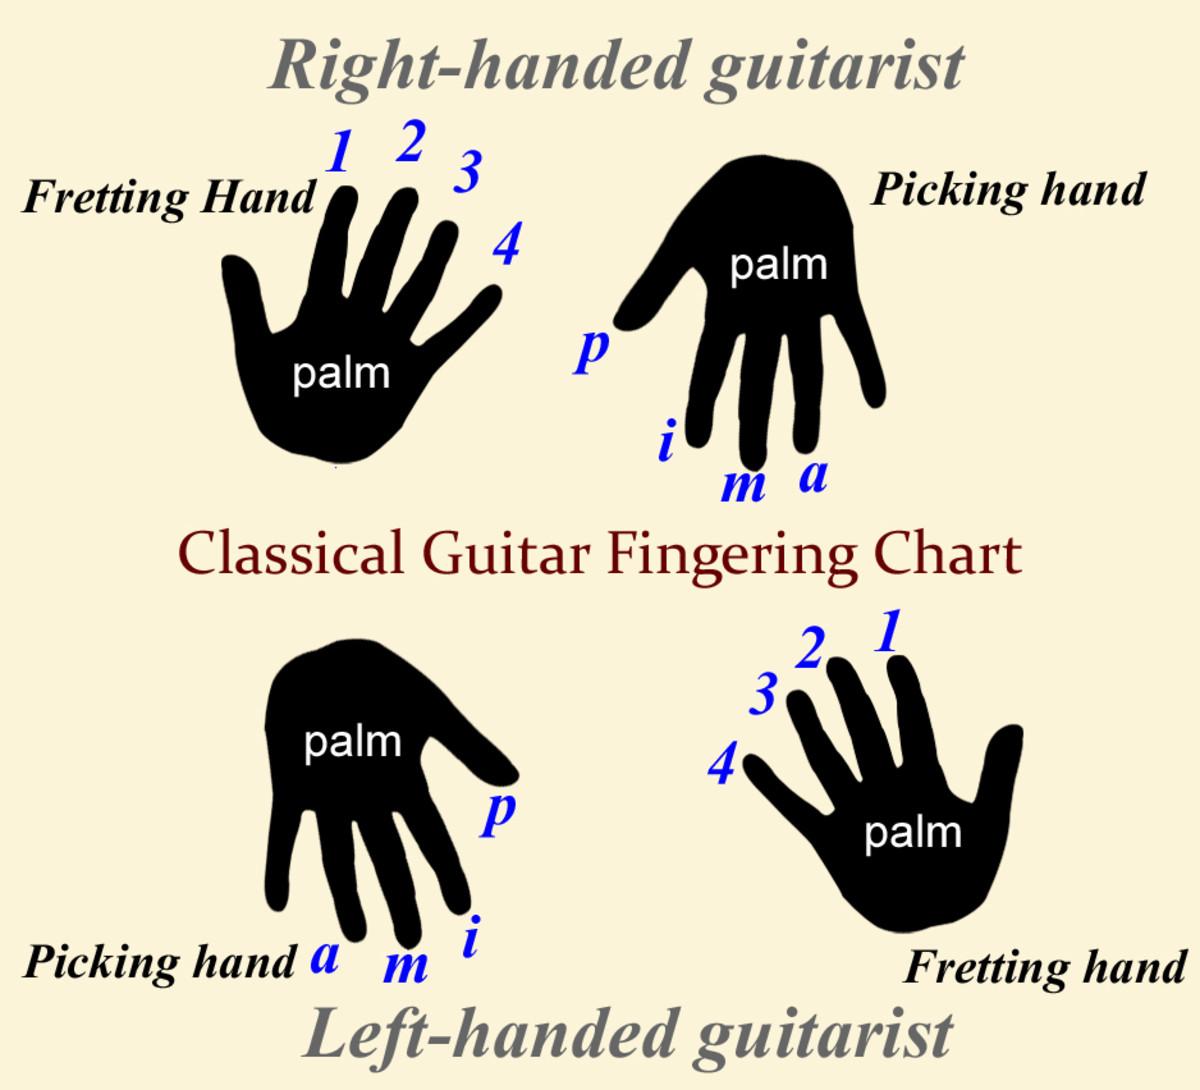 Classical Guitar Fingering